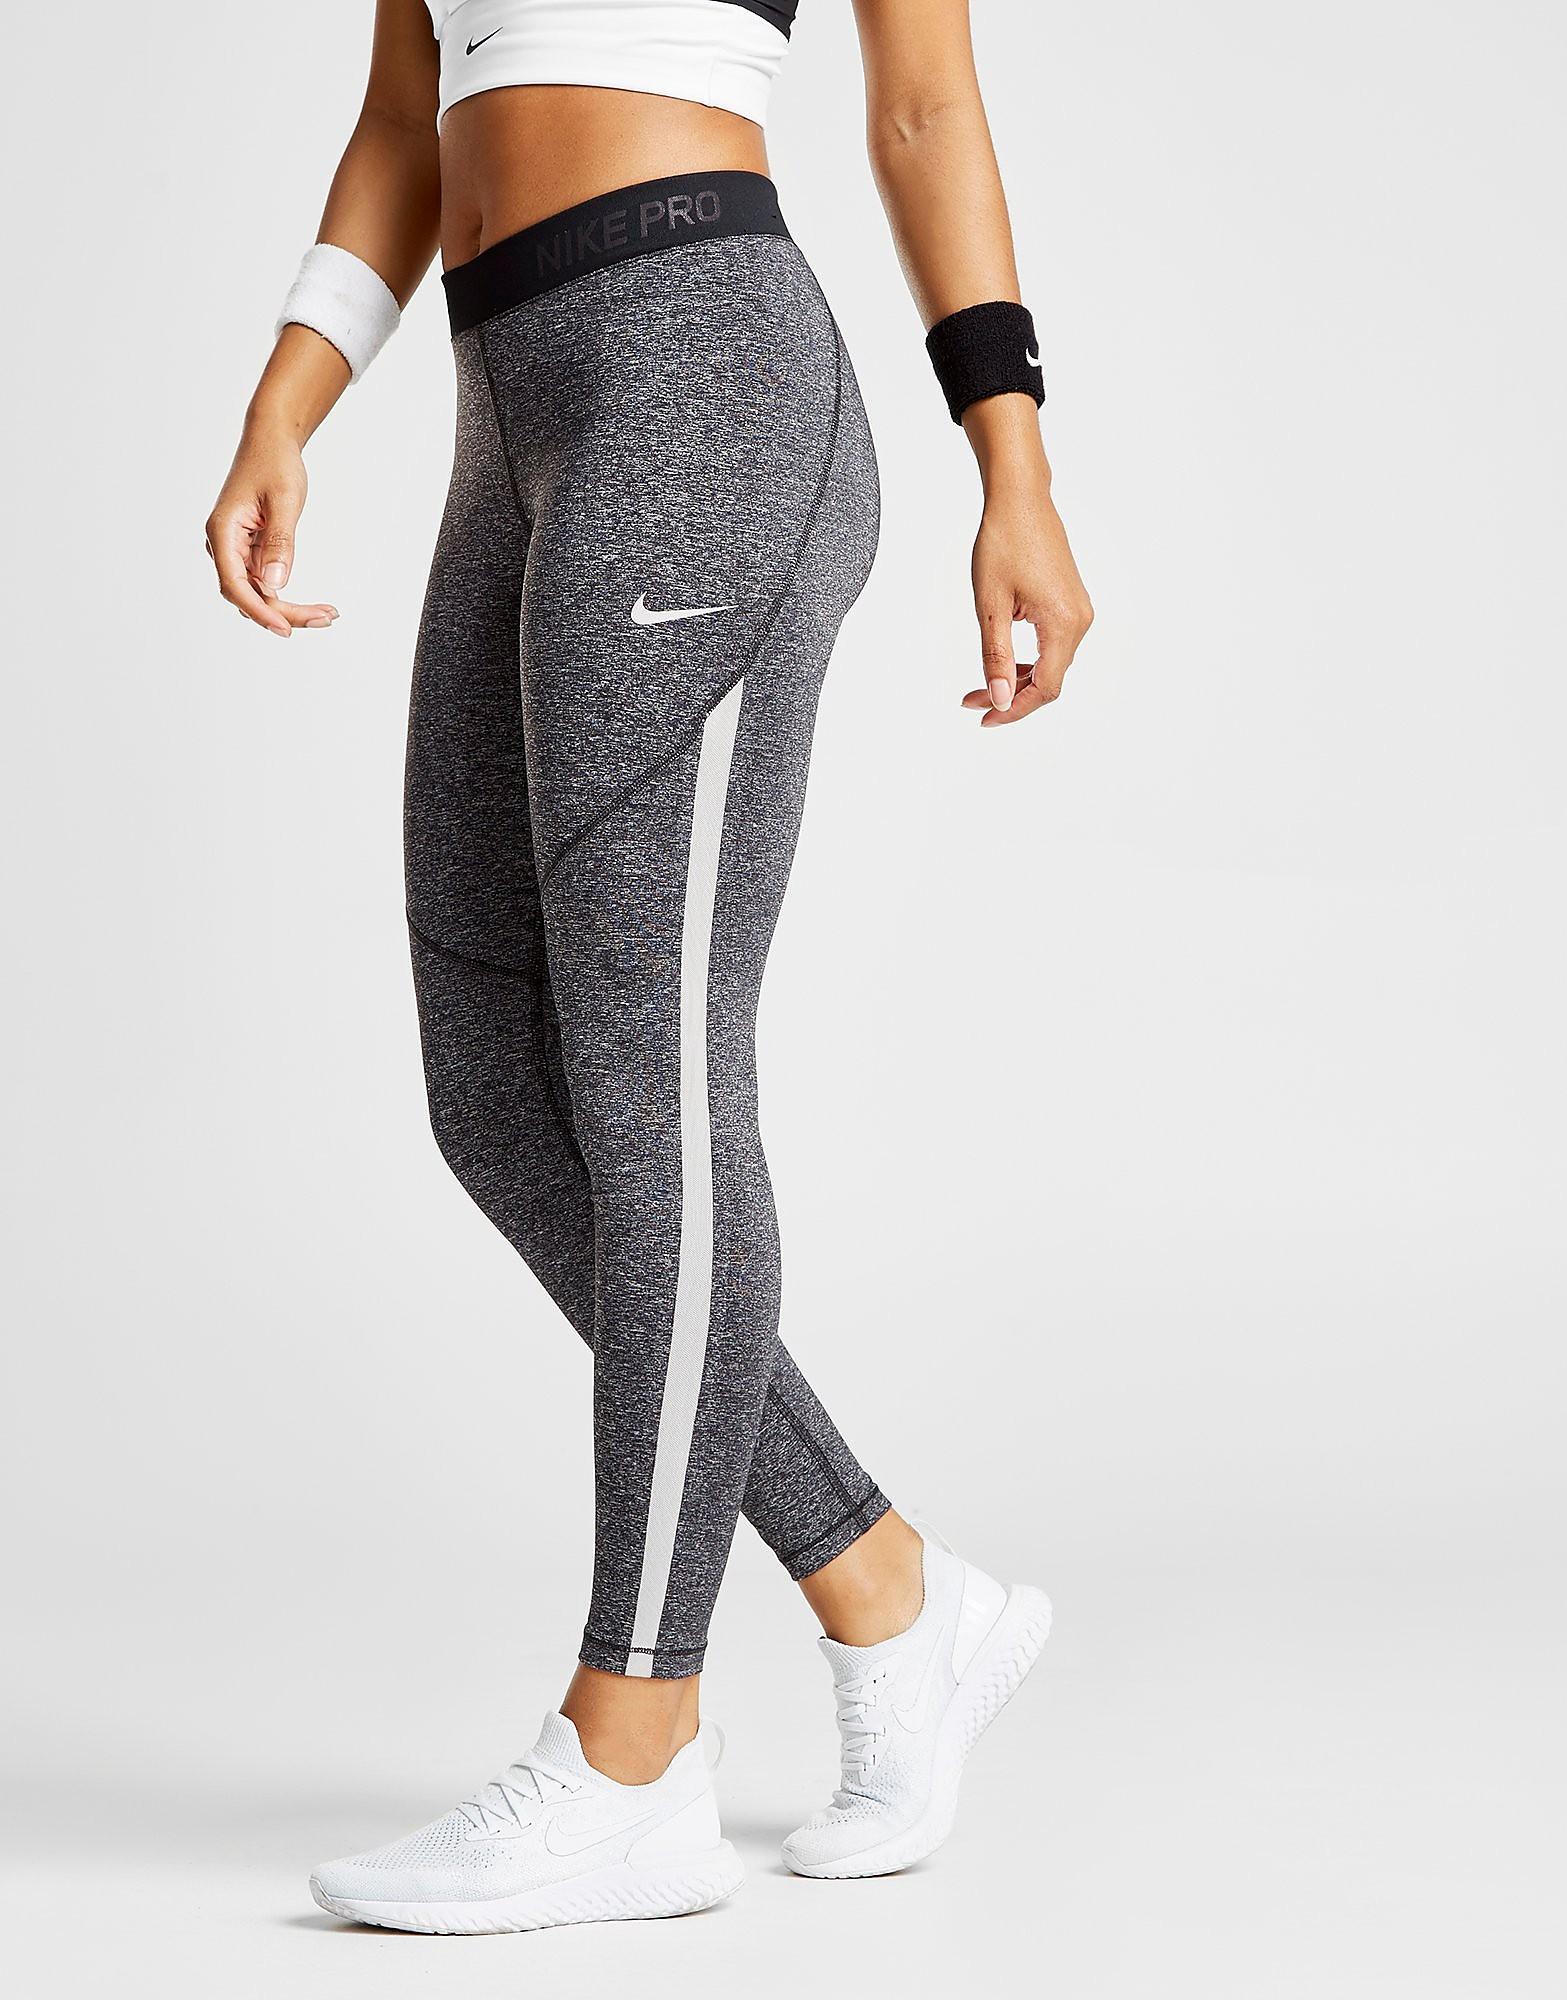 Nike Pro Hypercool Leggings